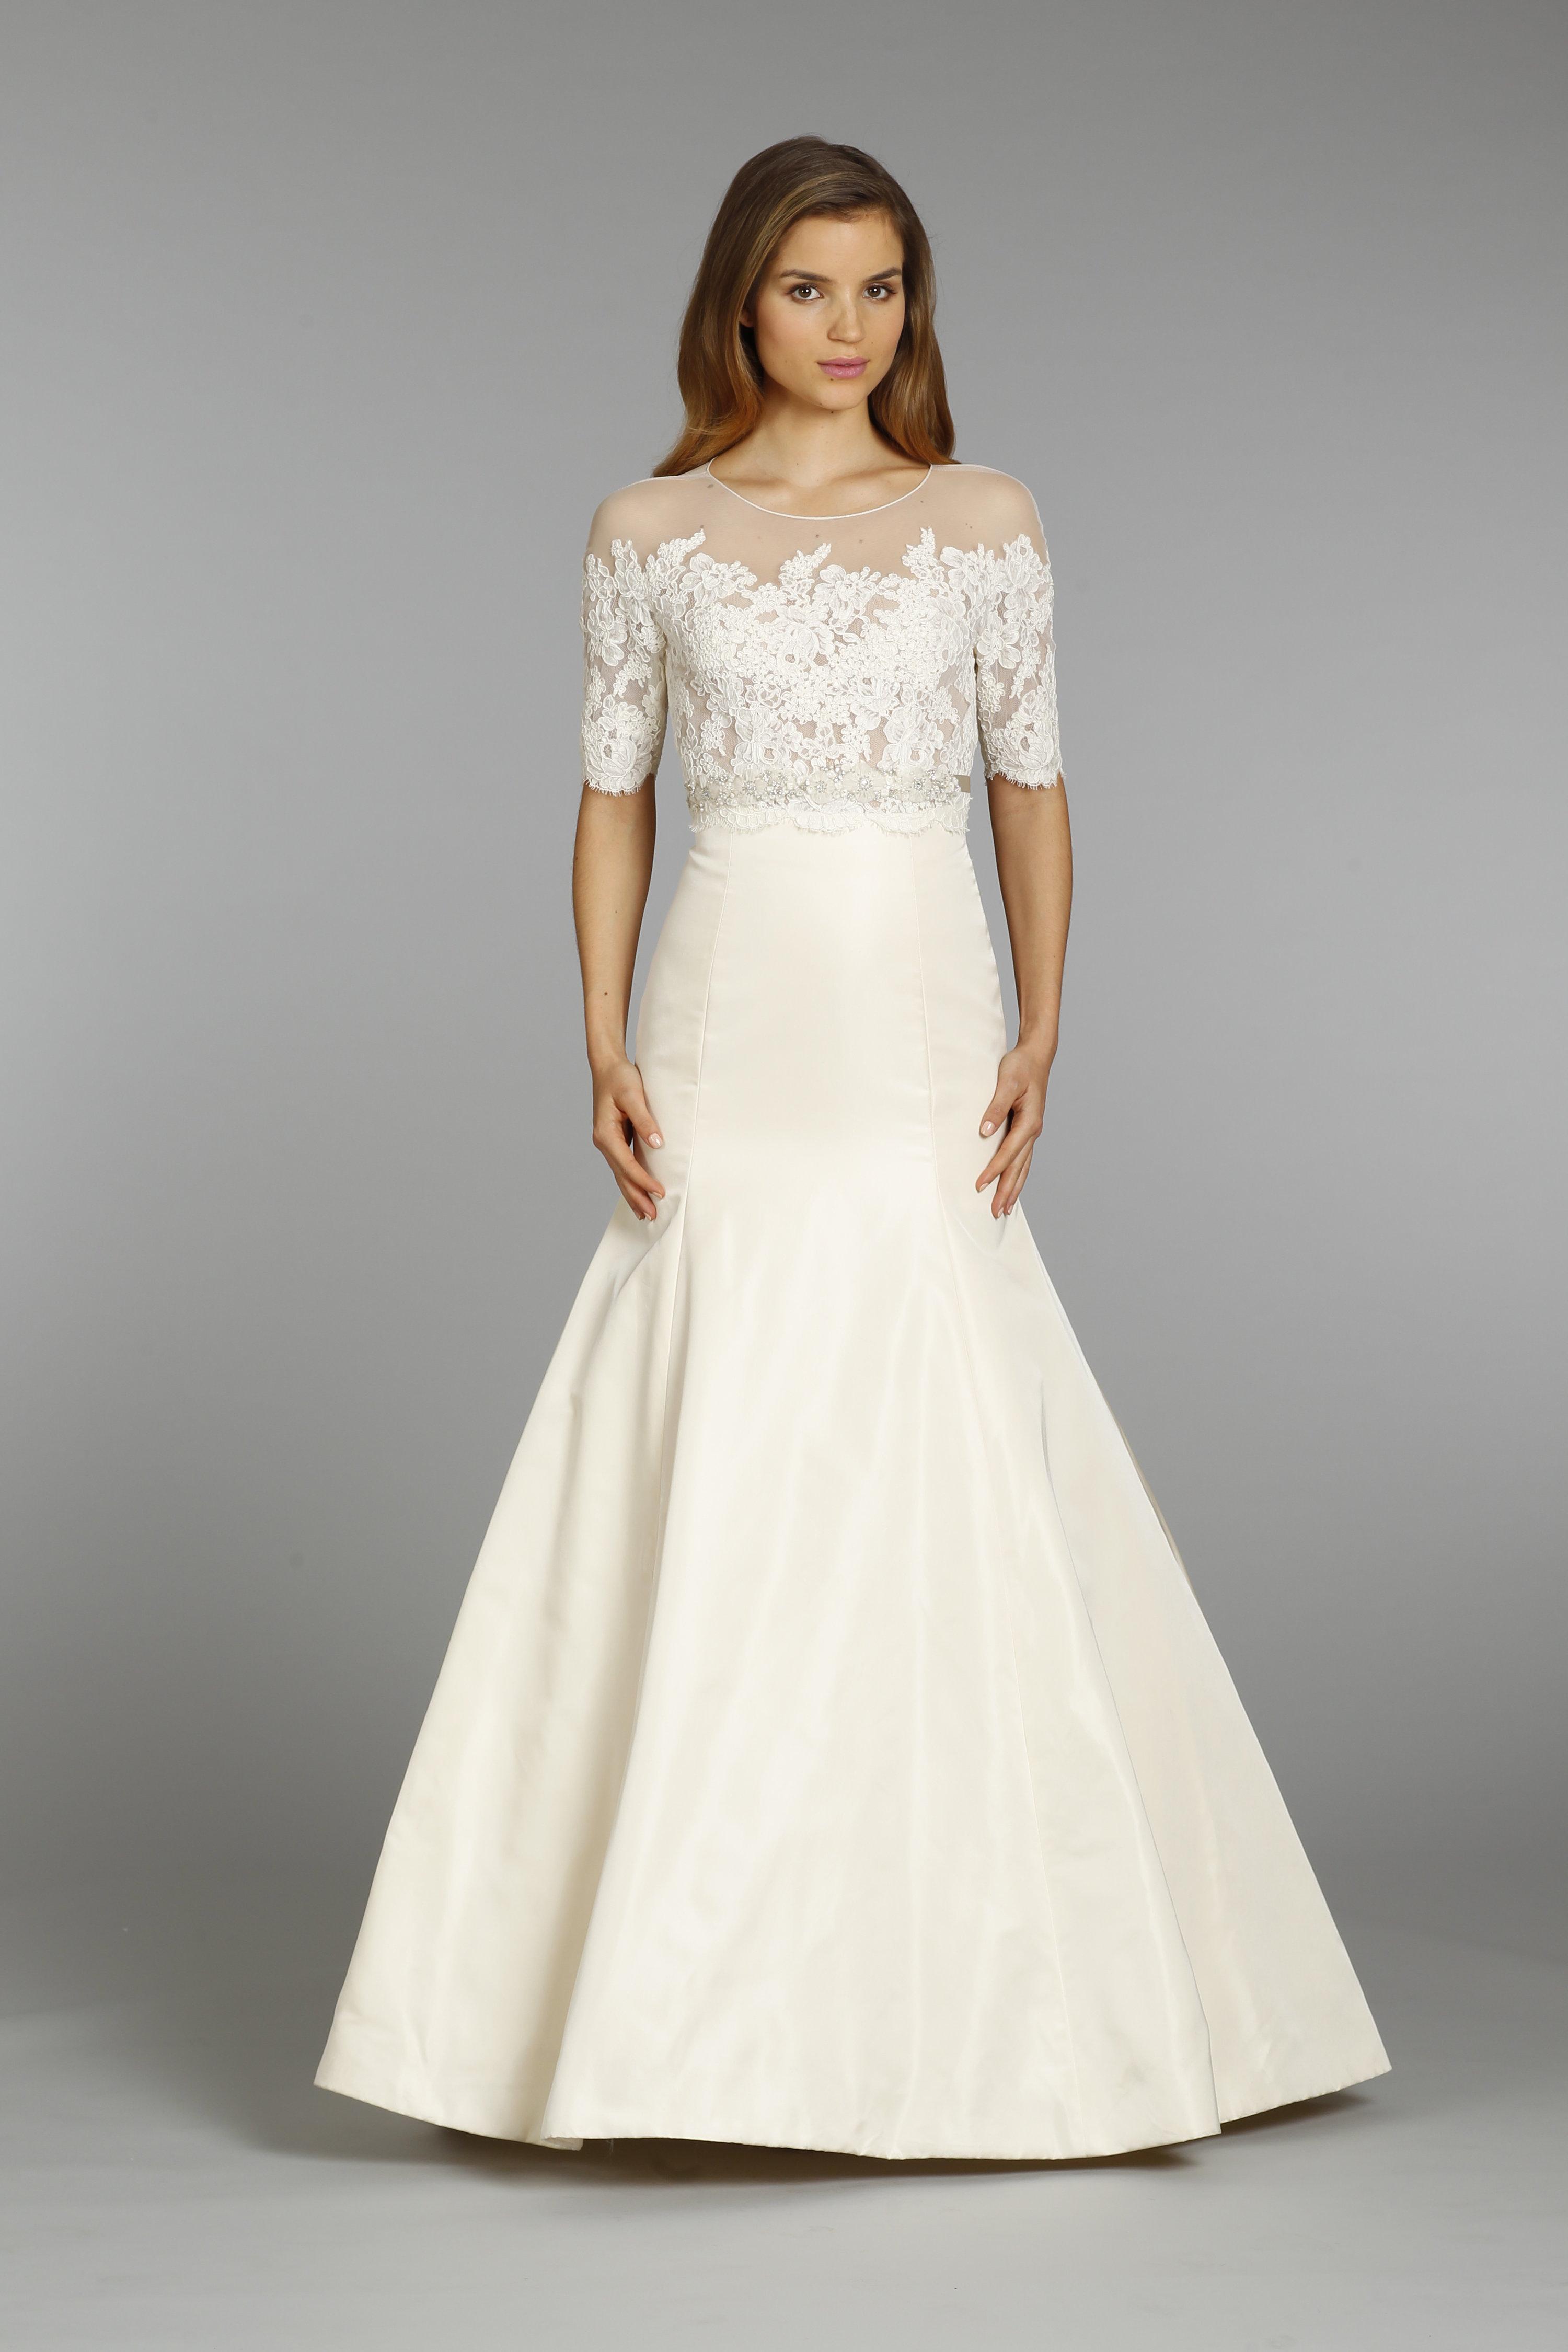 By Jim Hjelm Wedding Dresses